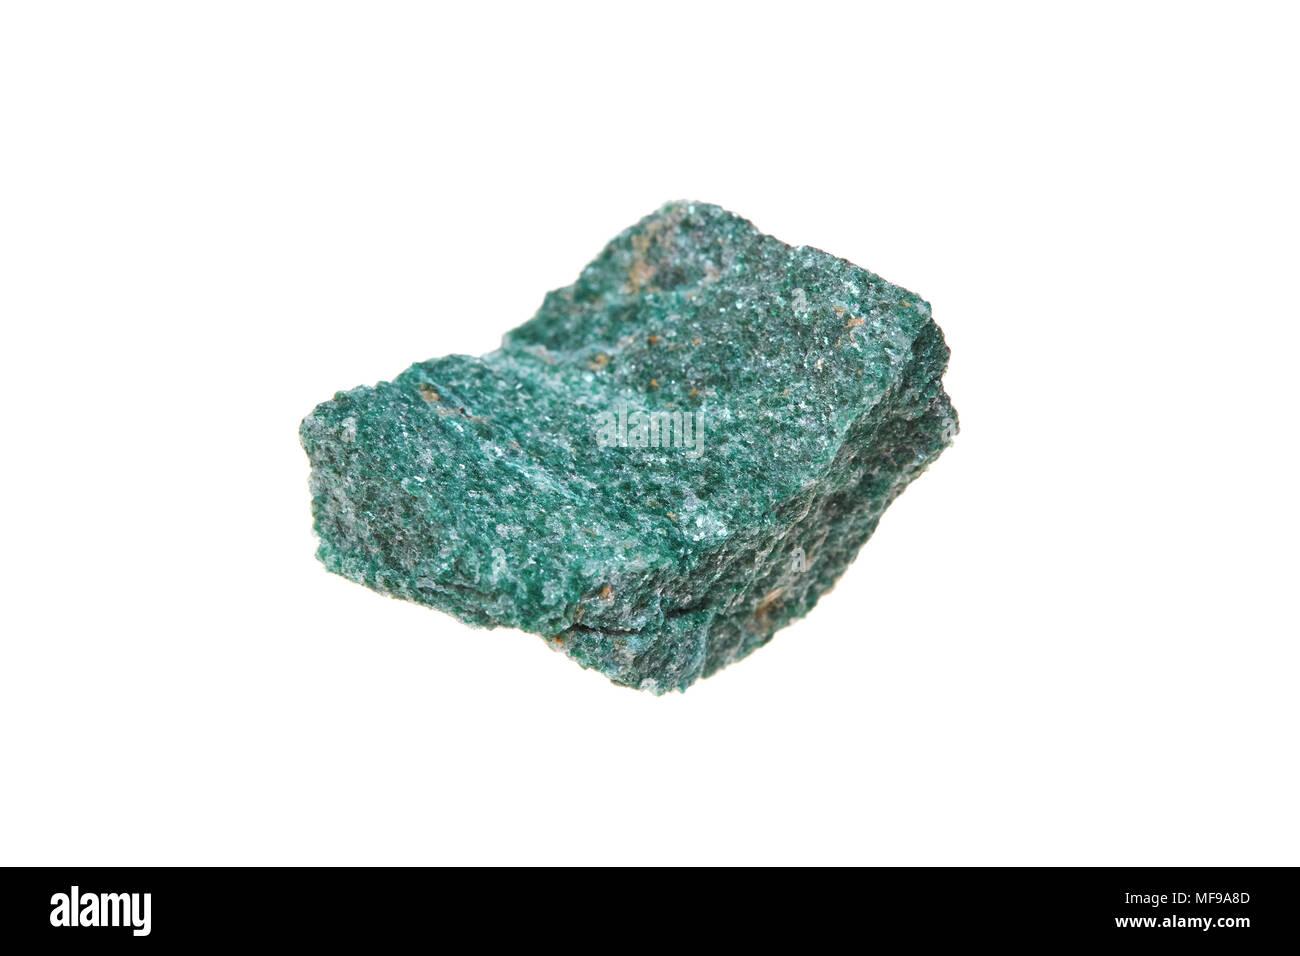 Fuchsite mineral stone, isolated on white background, macro - Stock Image